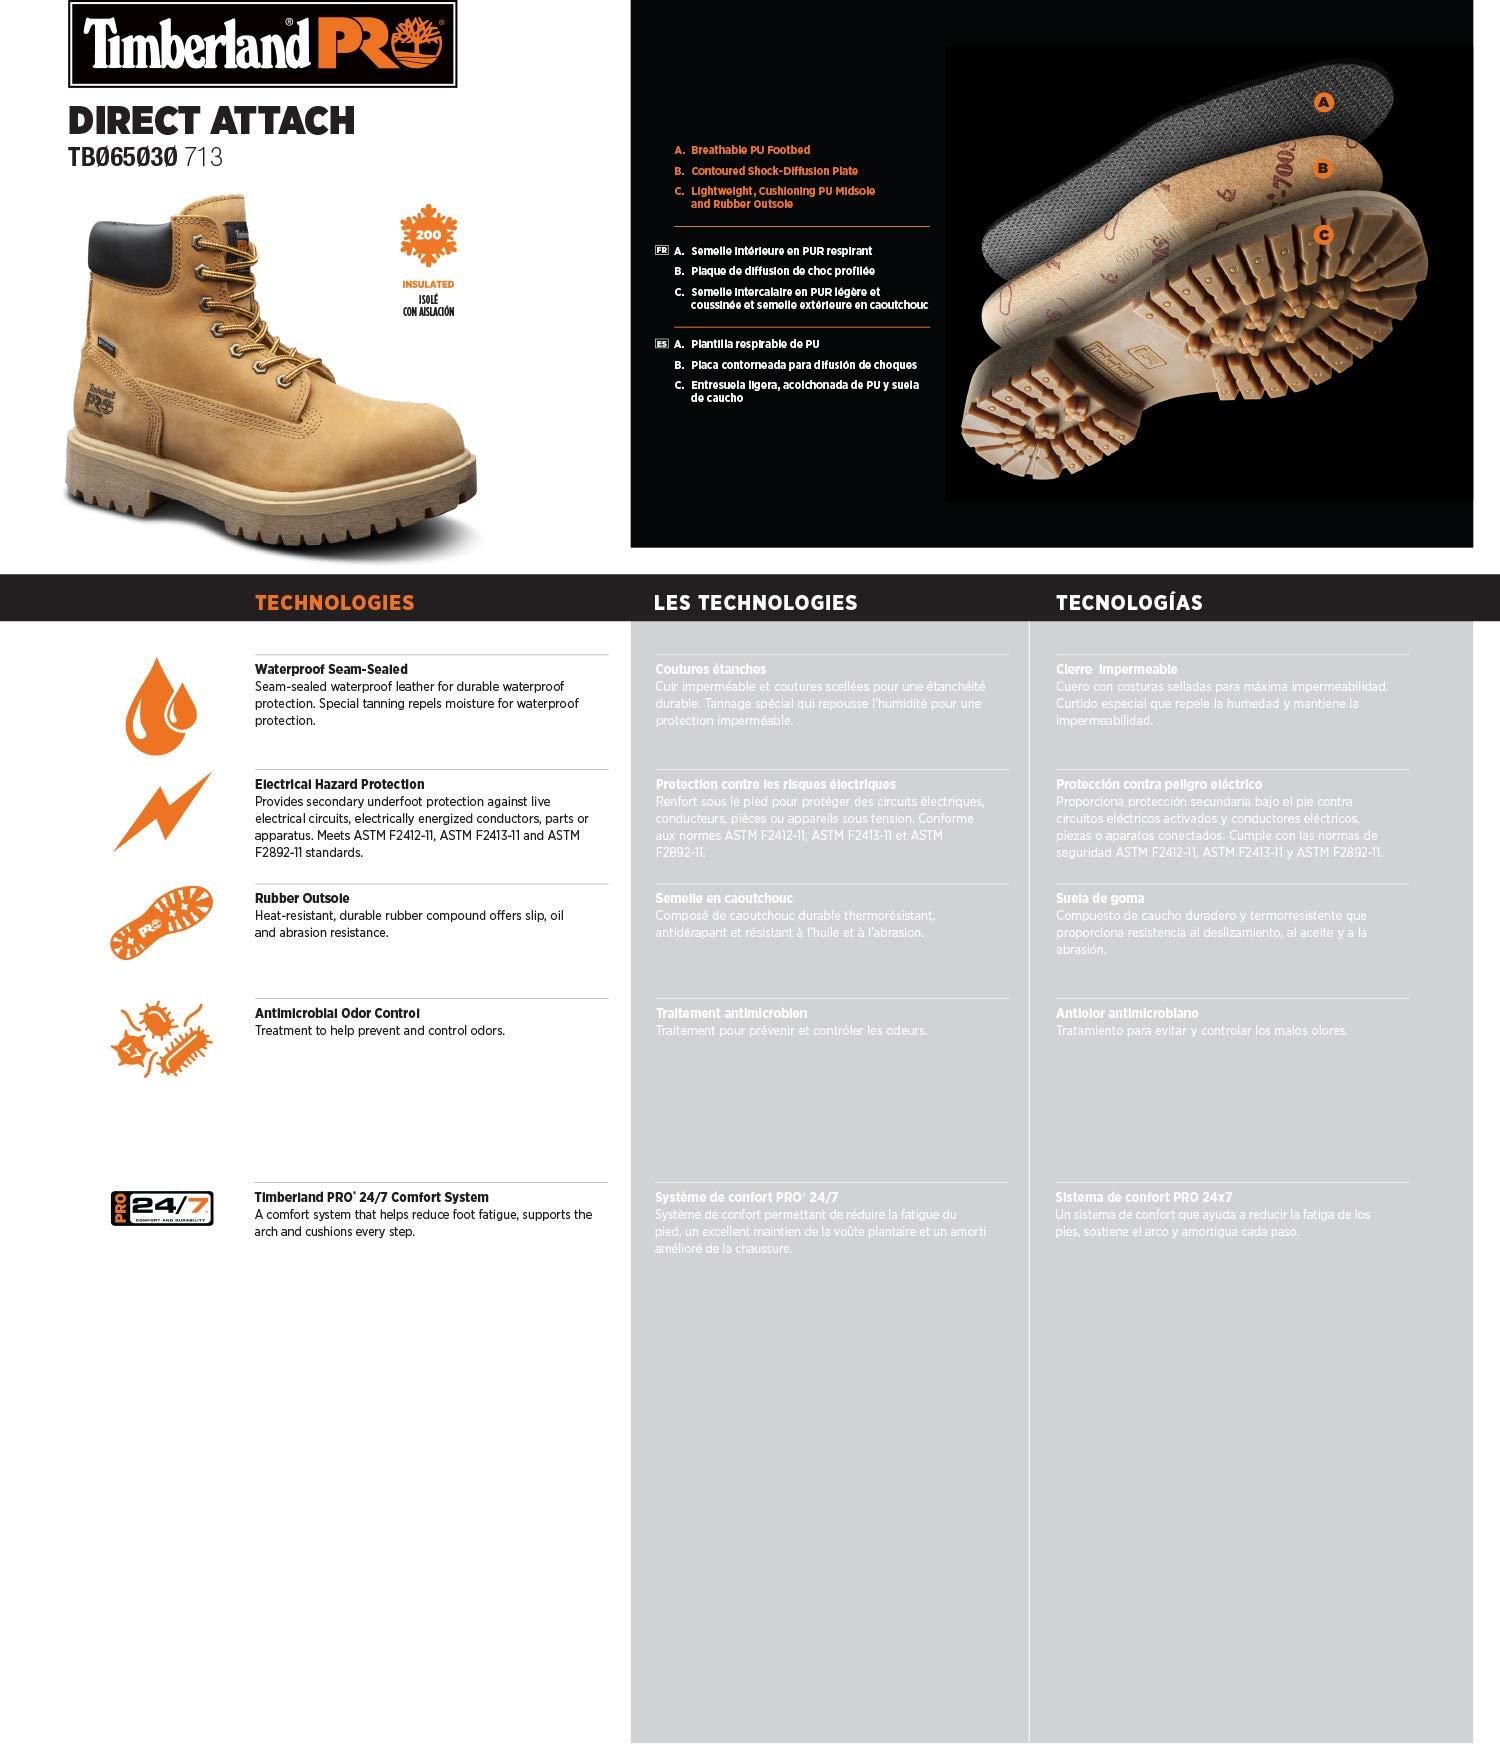 Timberland PRO Men's Direct Attach Six-Inch Soft-Toe Boot, Wheat Nubuck,9.5 W by Timberland PRO (Image #1)